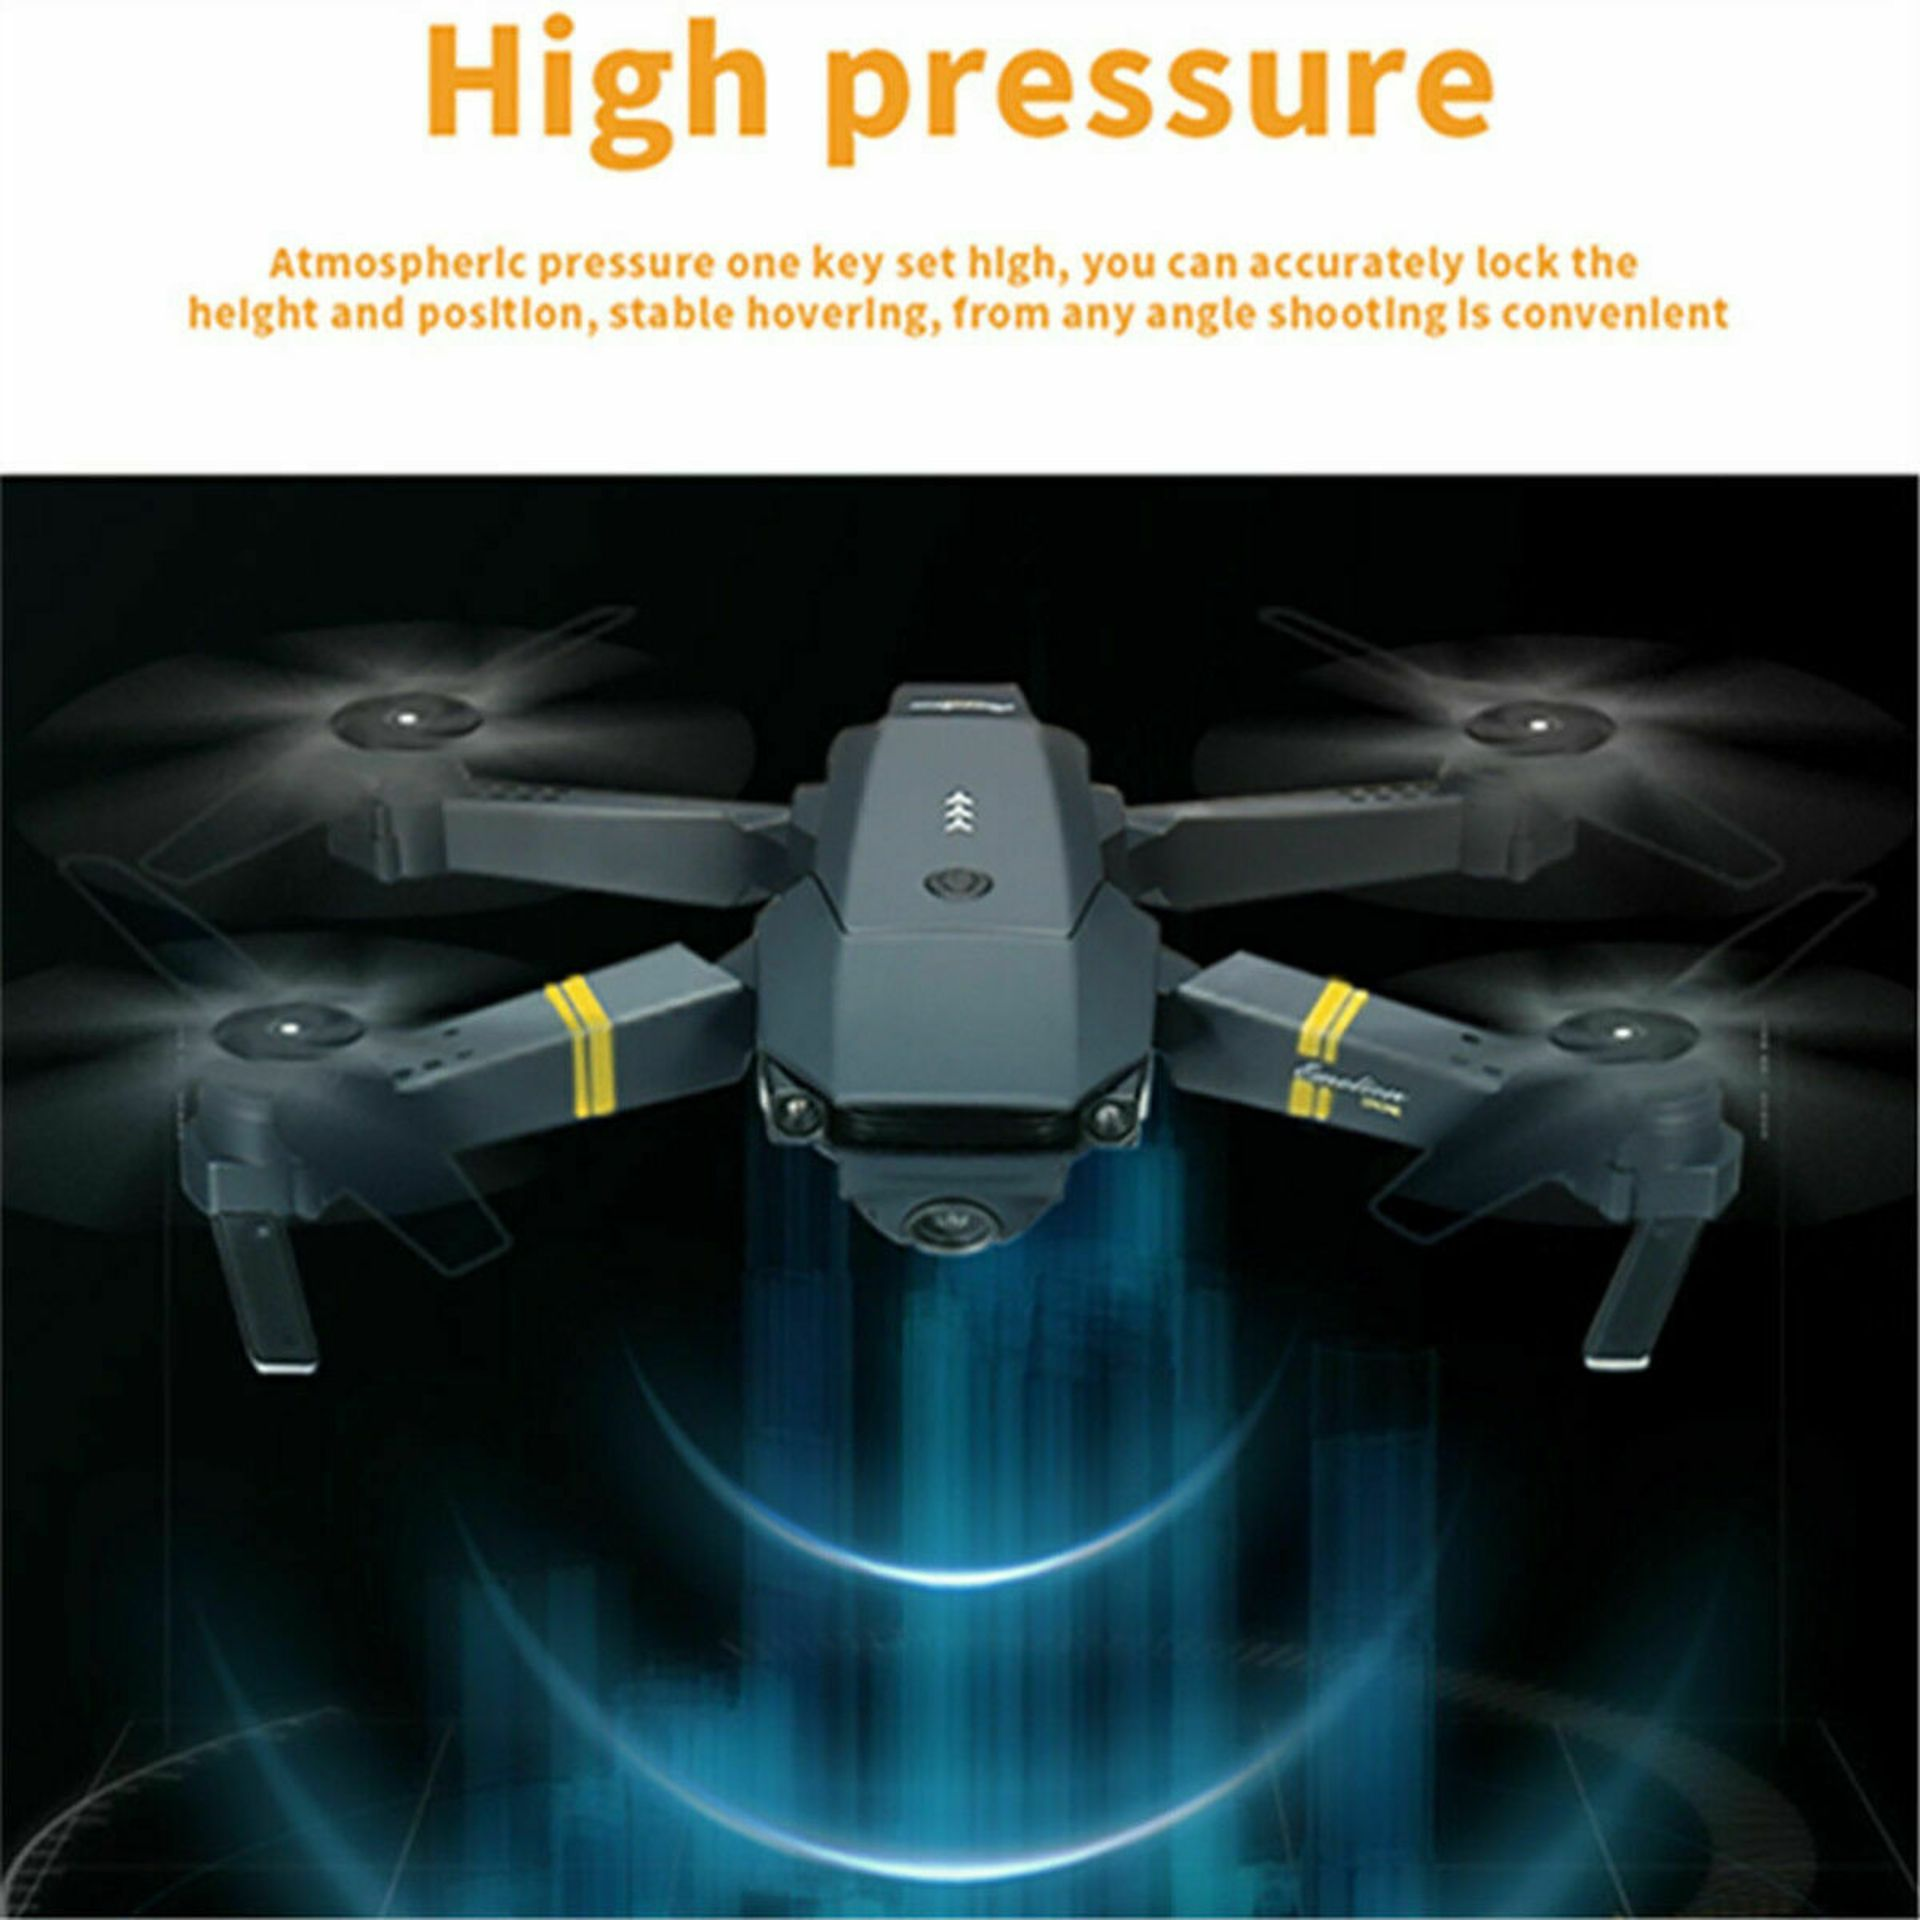 NEW & UNUSED DRONE X PRO WIFI FPV 1080P HD CAMERA FOLDABLE RC QUADCOPTER + BAG *PLUS VAT* - Image 3 of 12